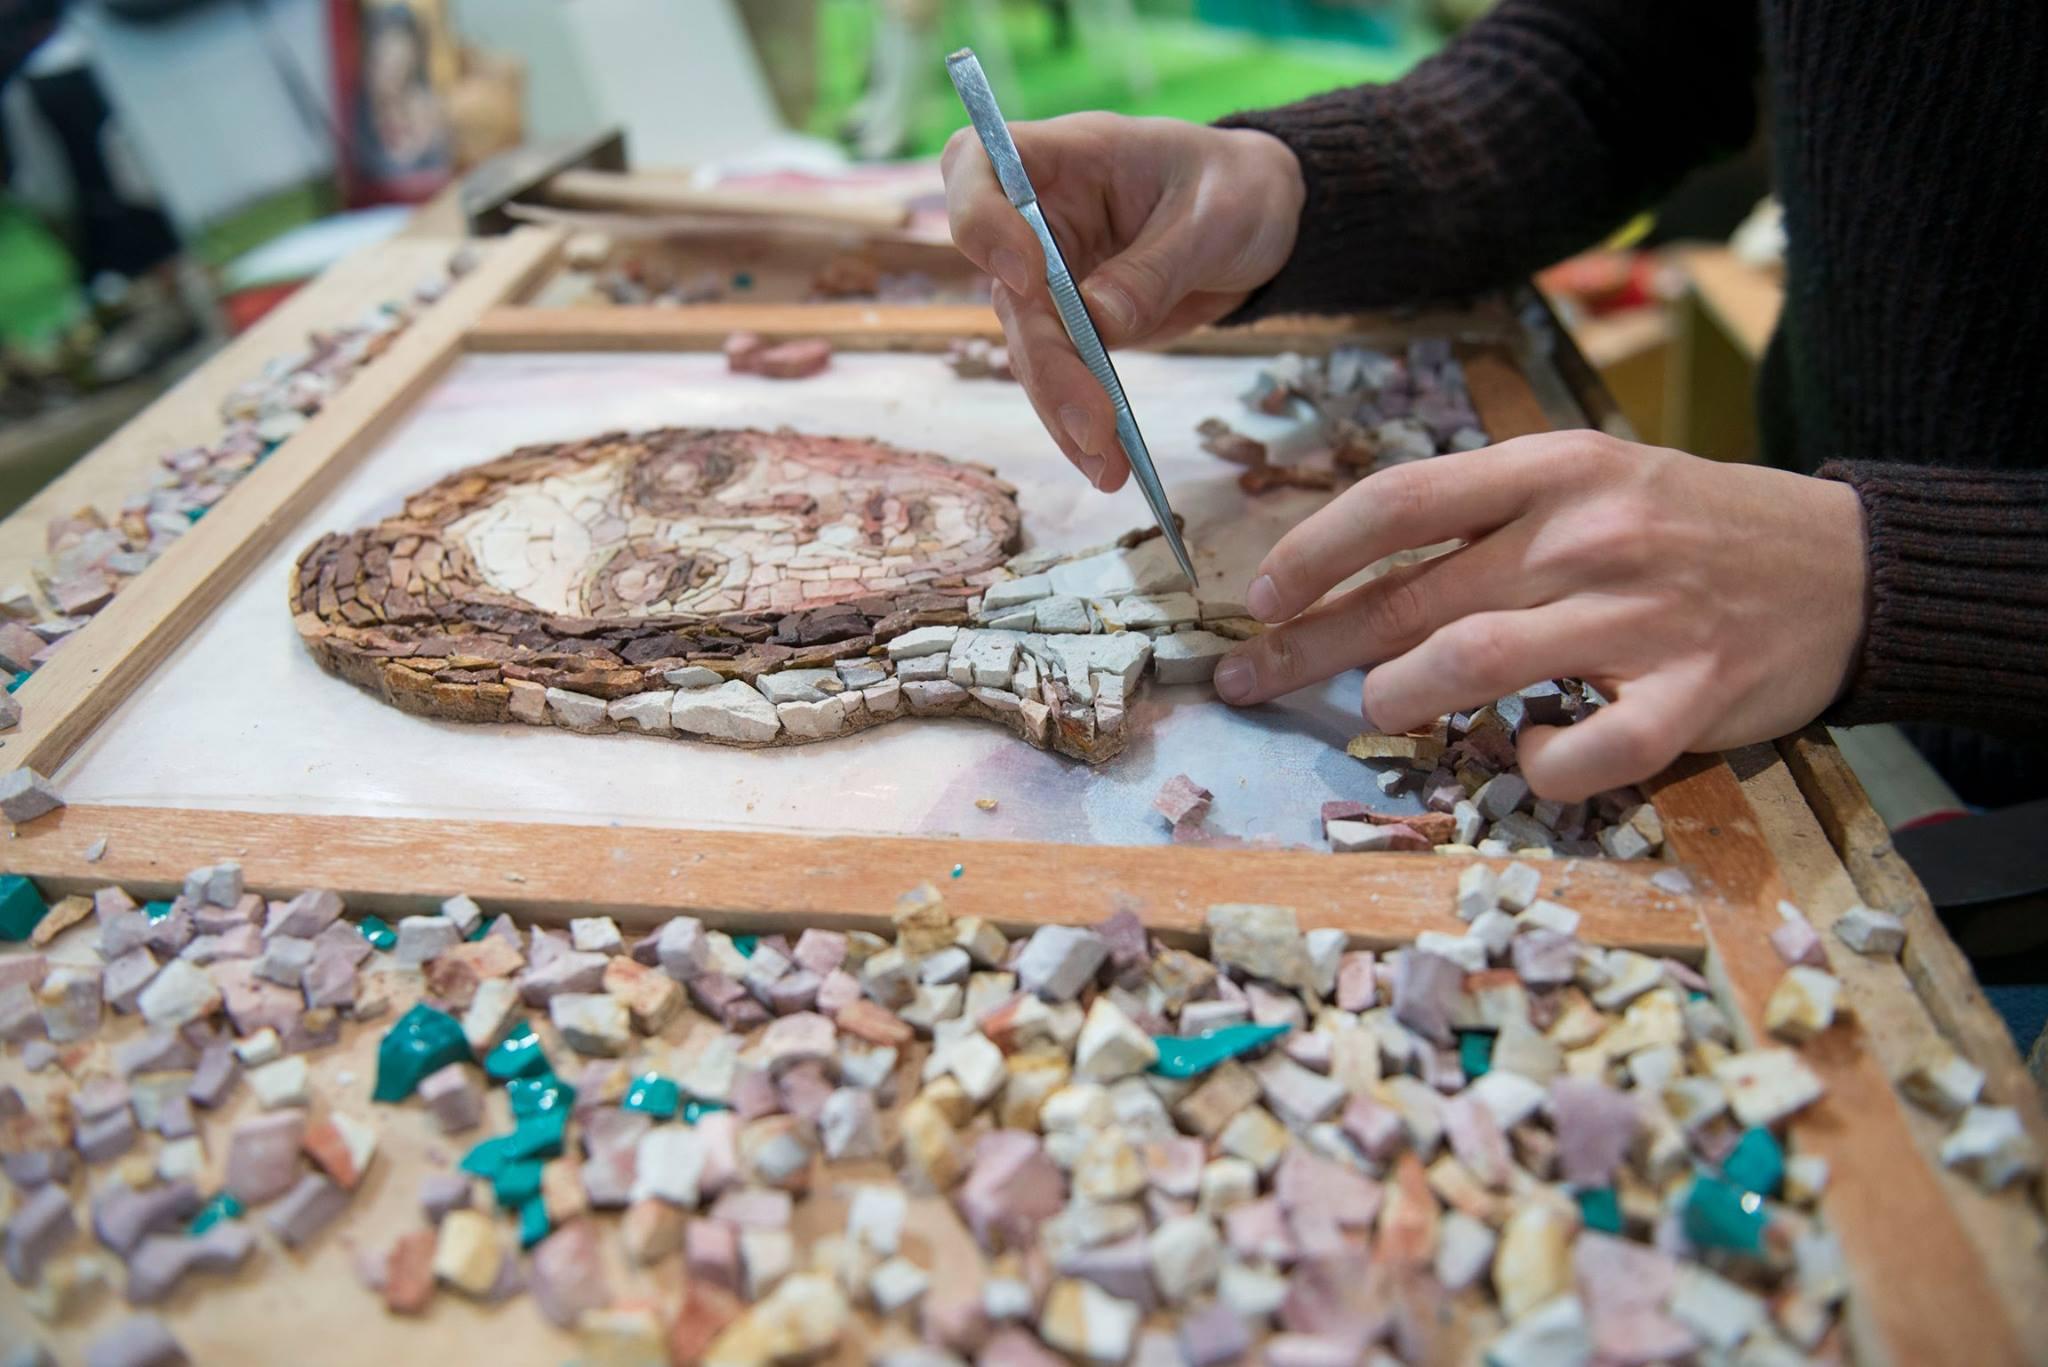 artigiano in fiera, Handwerksmesse, milano, Italia, Italy, artigiani, fiera, tradizioni, traditions, craft, Feria, Artesanado, Milán